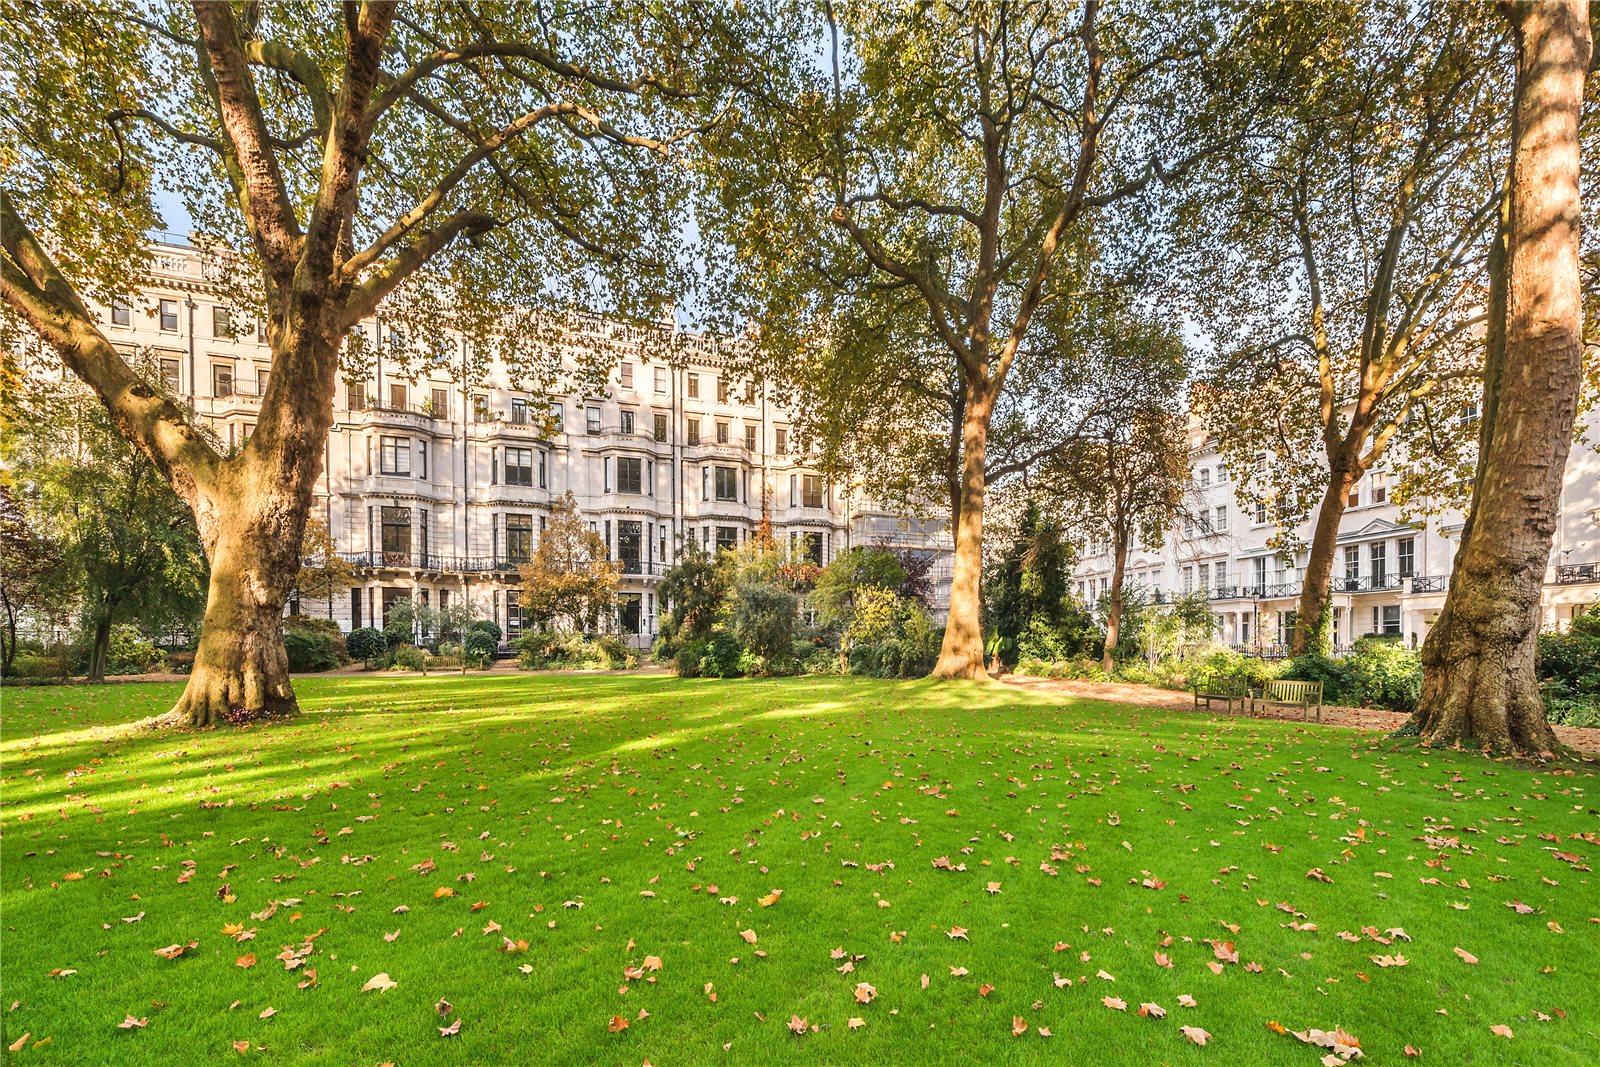 Apartamentos para Venda às Ennismore Gardens, London, SW7 London, Inglaterra